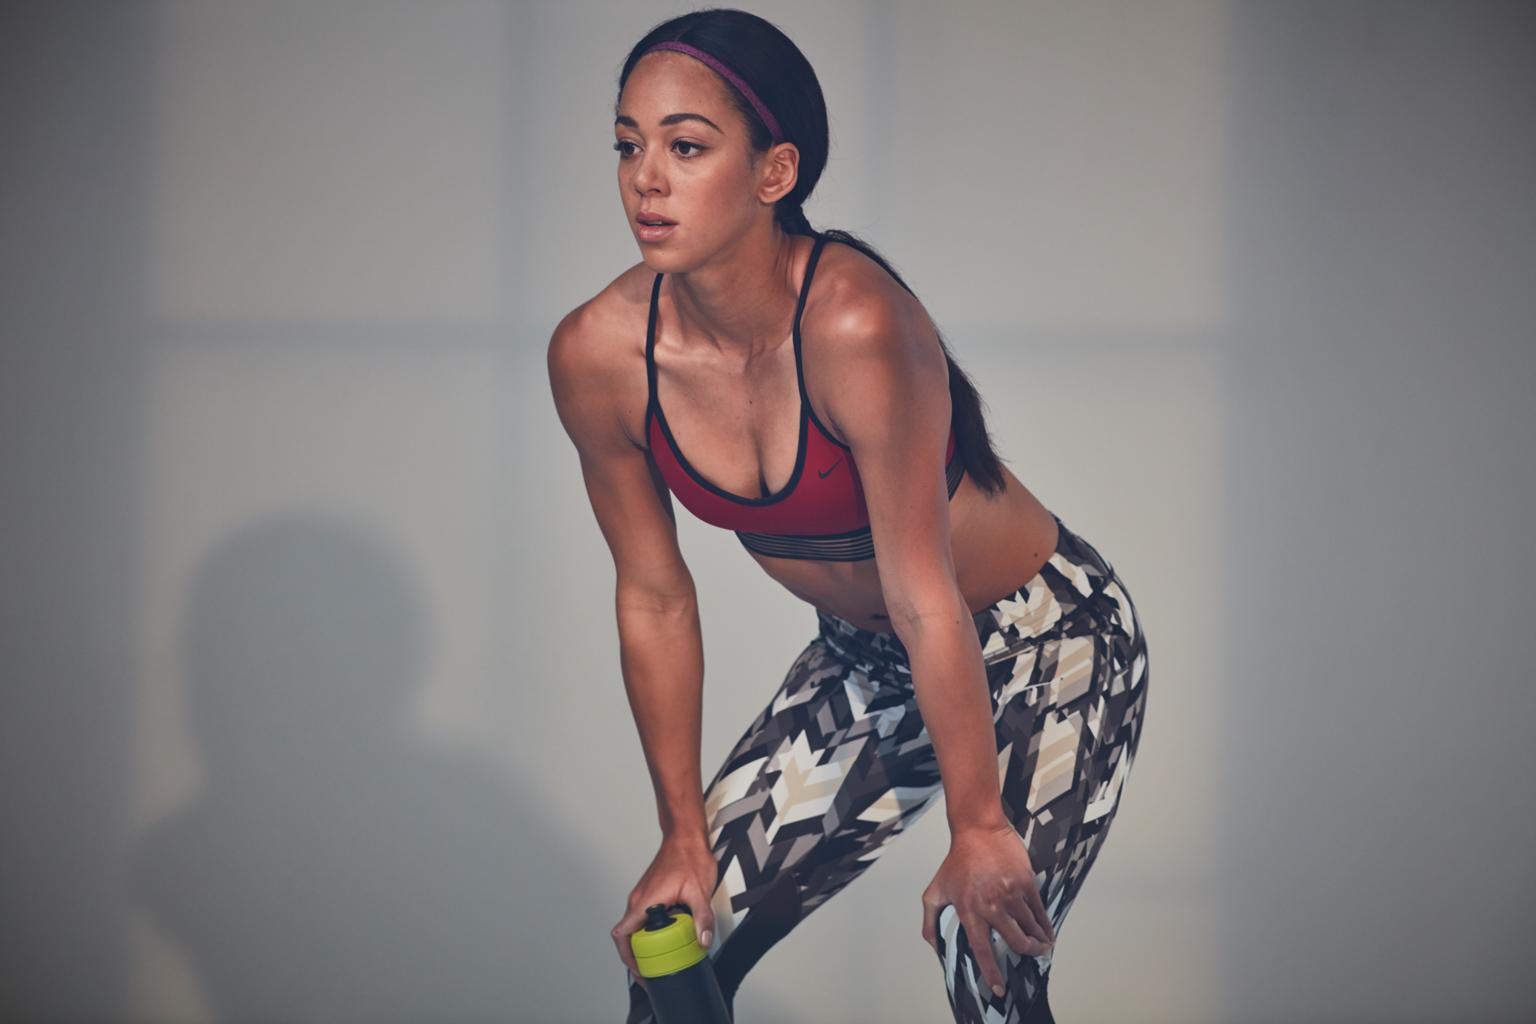 Am Katarina Model blogger interview katarina johnson thompson olympic brita water